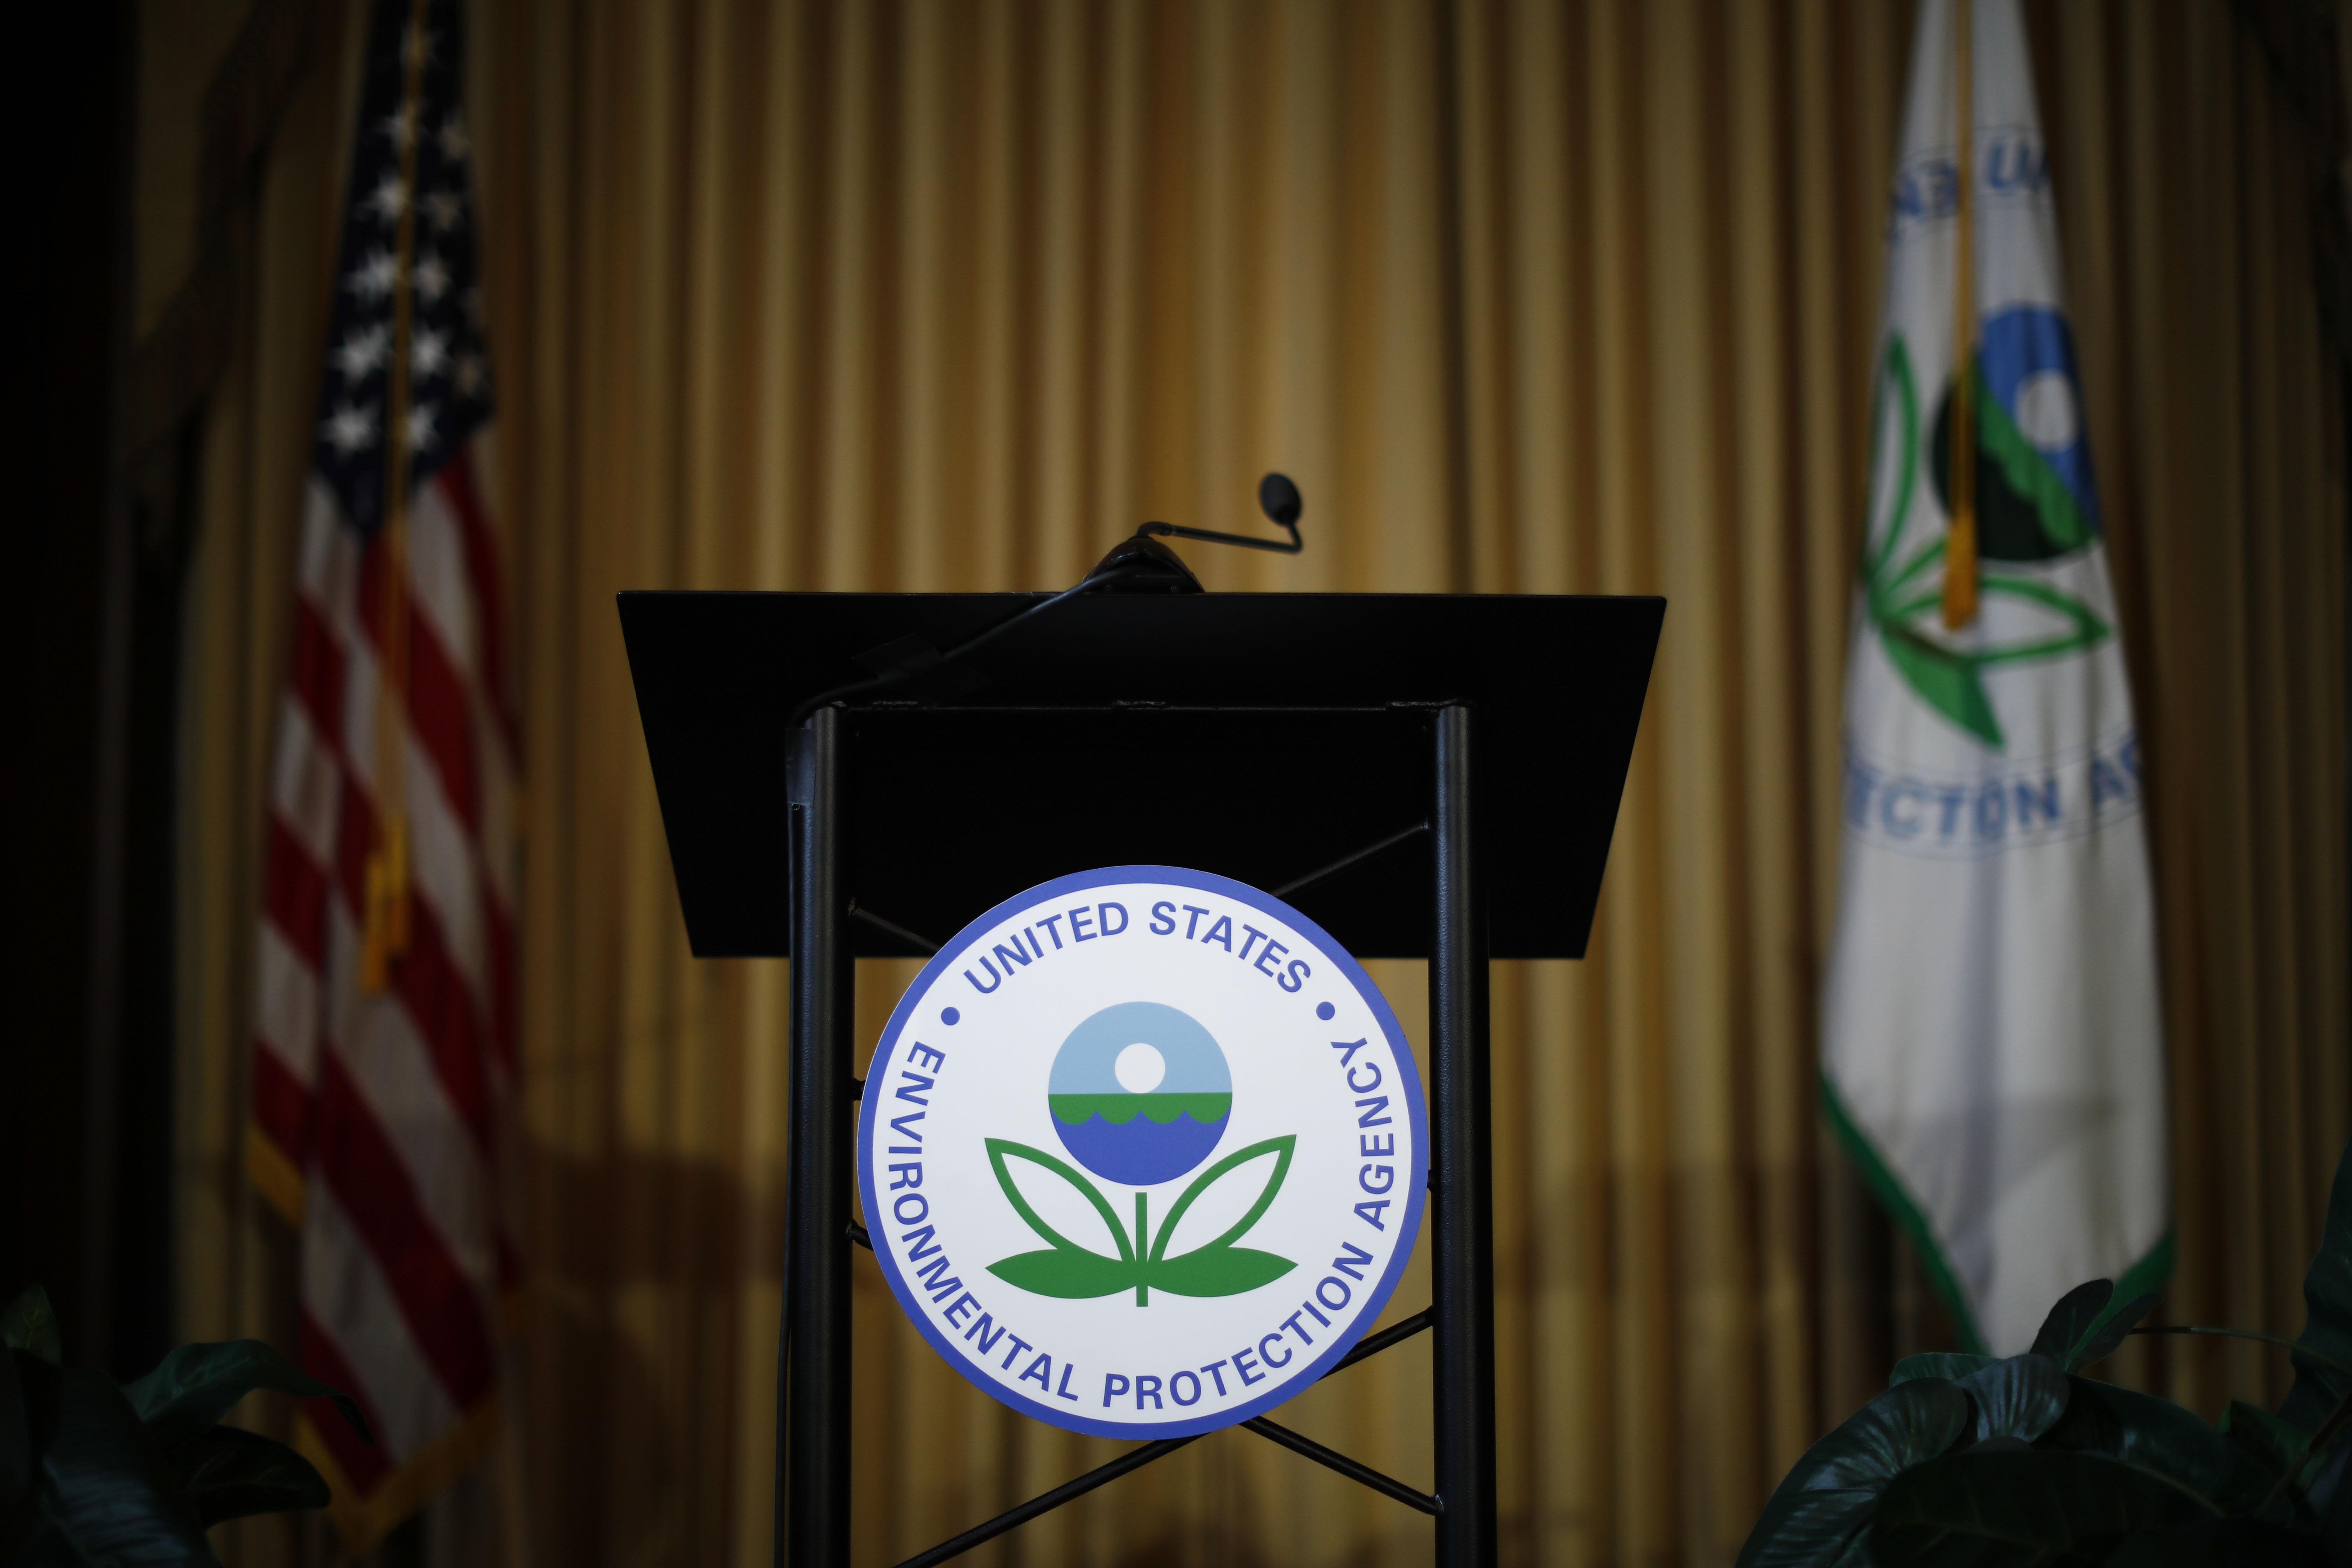 Podium awaits the arrival of U.S. EPA Acting Administrator Andrew Wheeler to address staff at EPA Headquarters in Washington